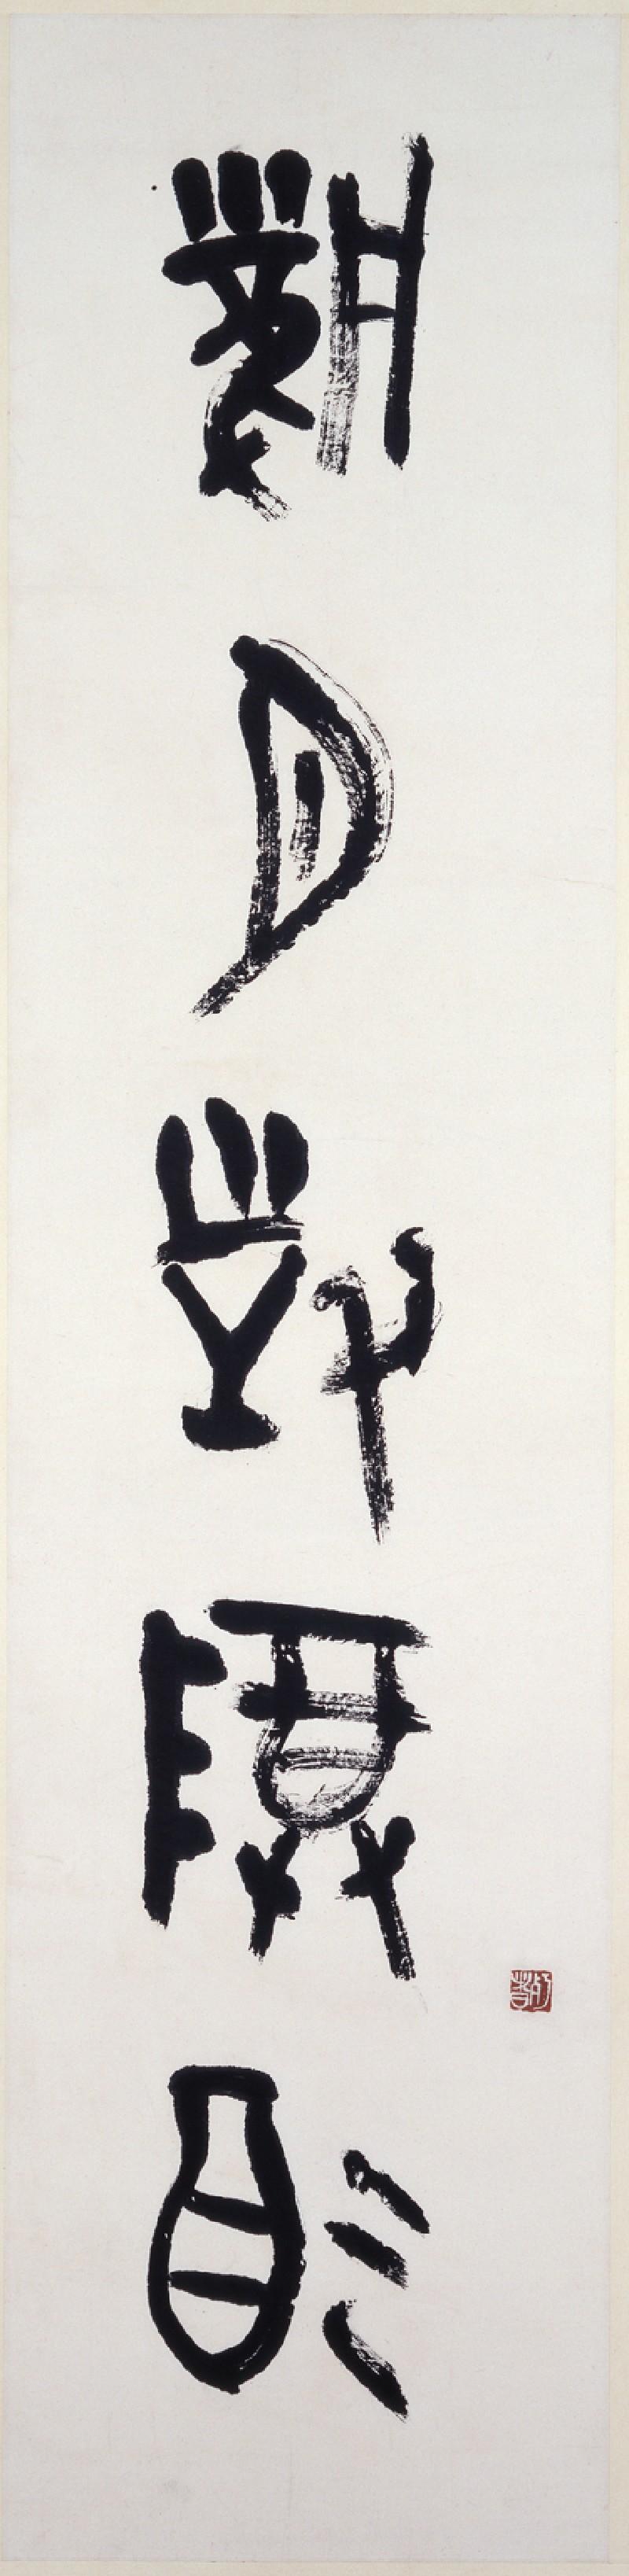 Calligraphic couplet written in archaic script